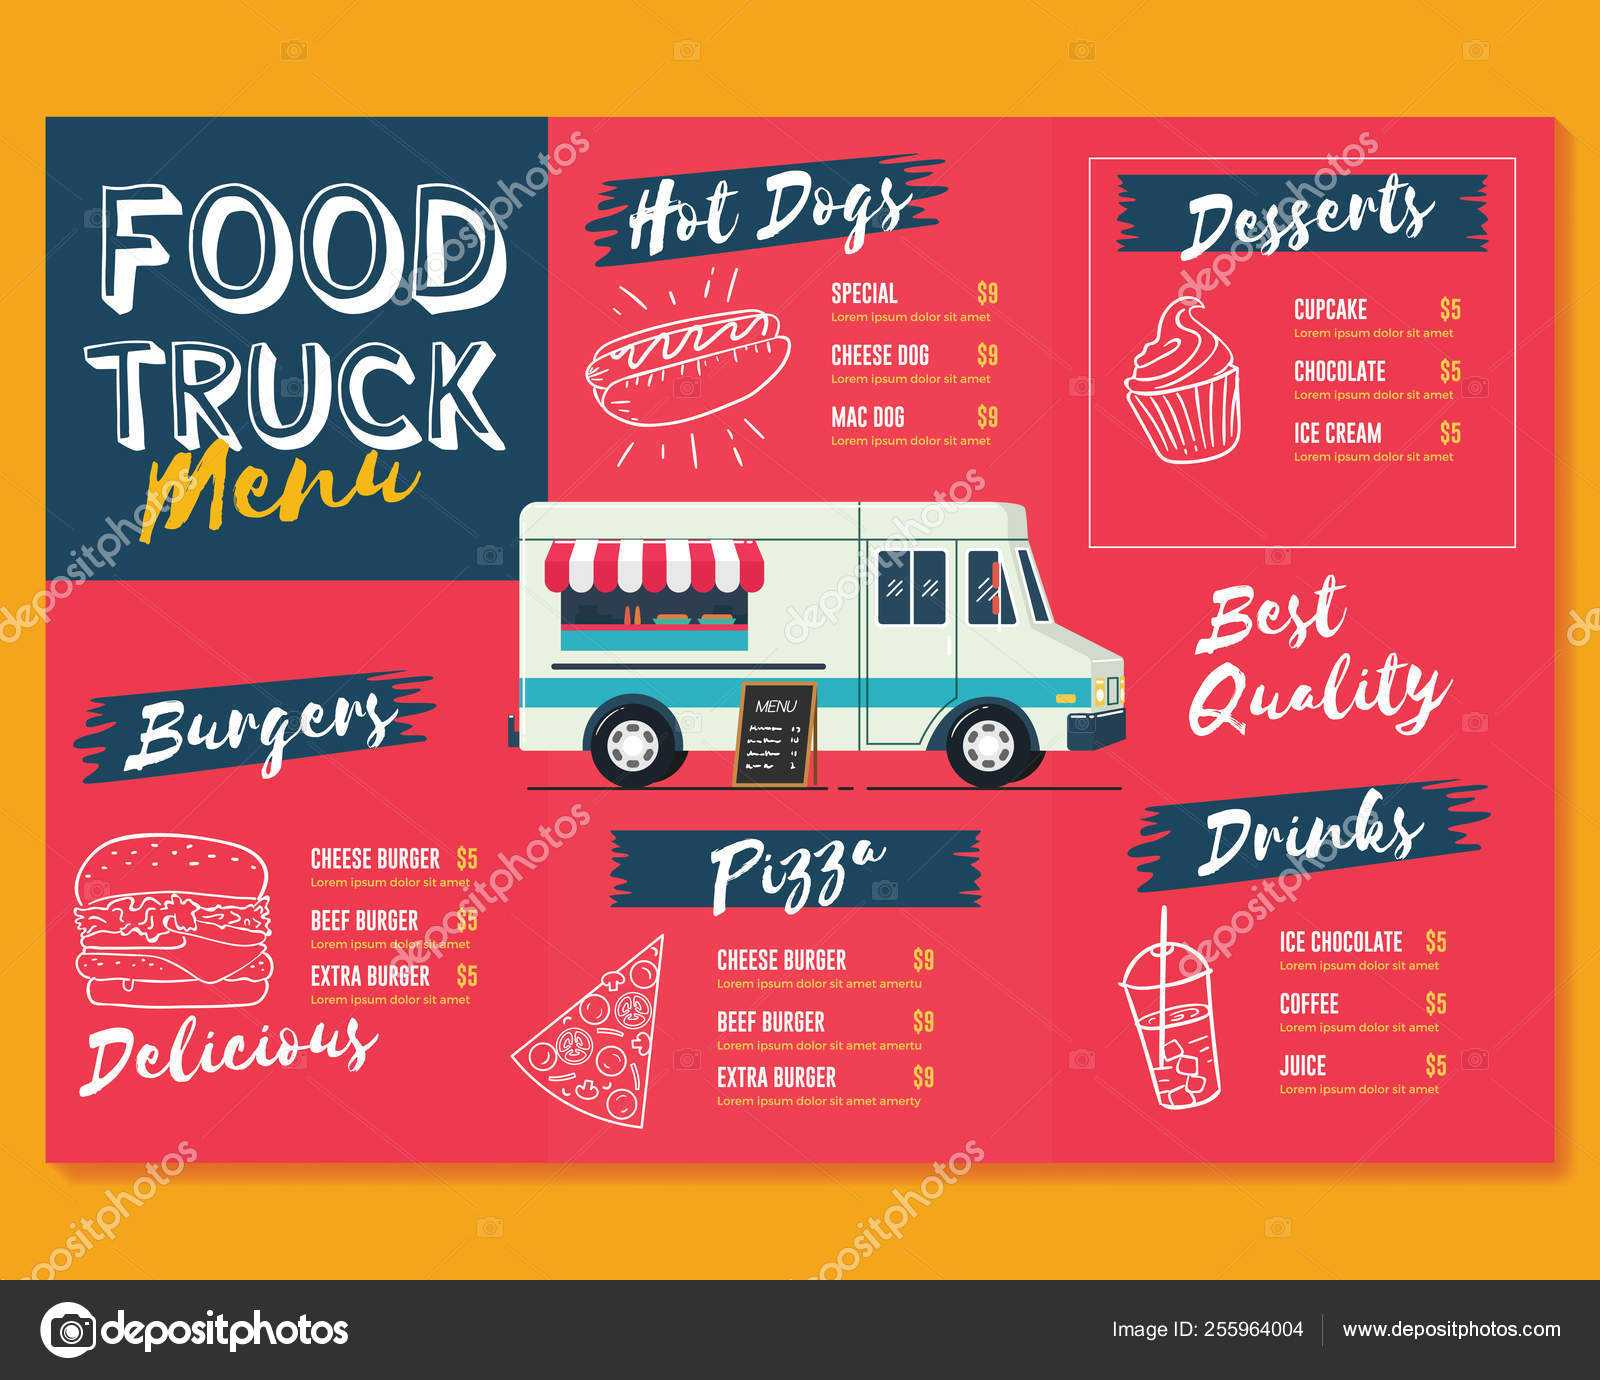 Food Truck Menu Template. Fast Food Brochure Menu — Stock With Regard To Food Truck Menu Template